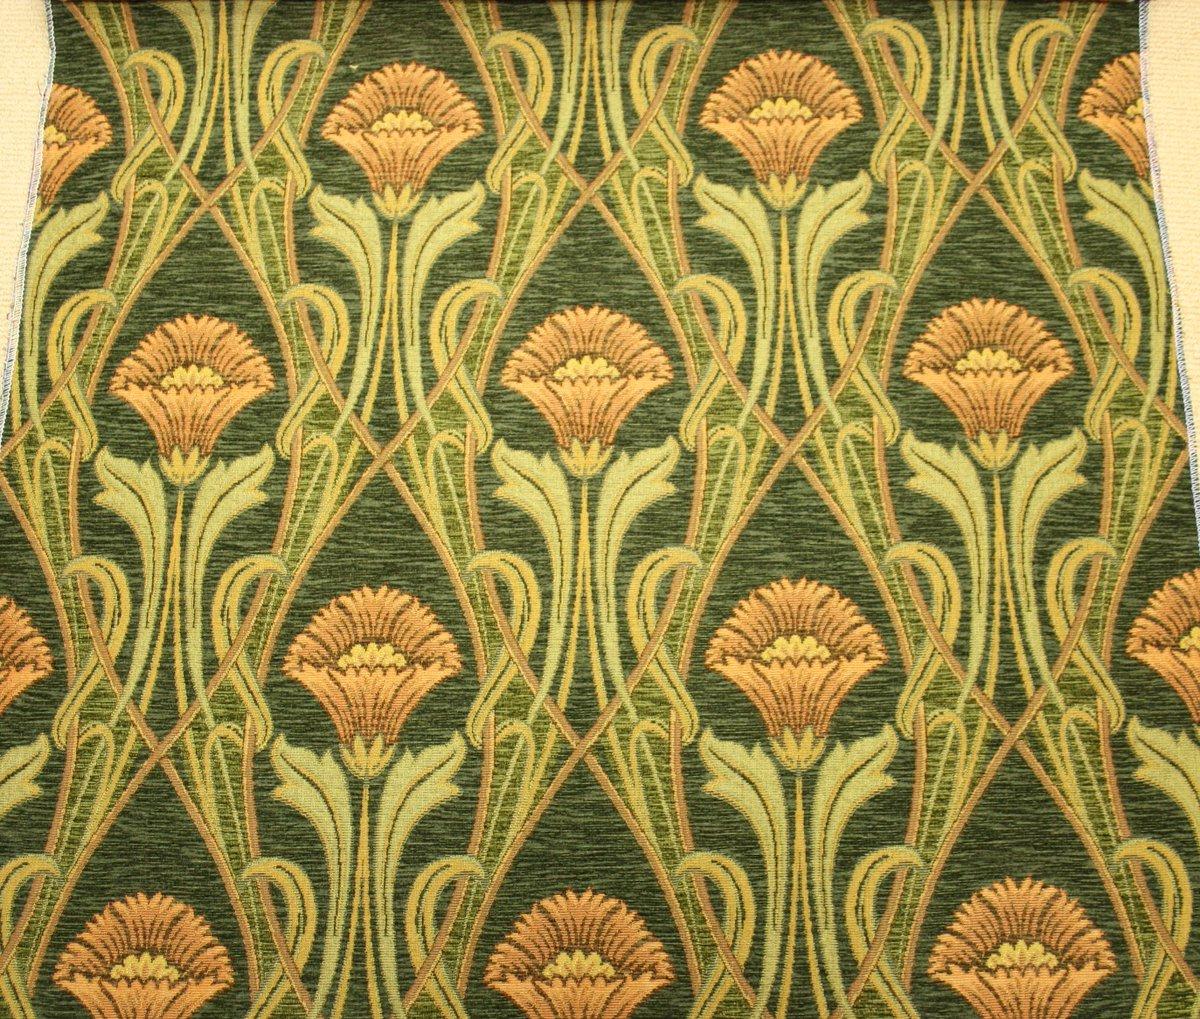 Art Deco Meubelstof.Maison L Art Nouveau Auf Twitter Bij Zo N Subtiel Behang Mag Best